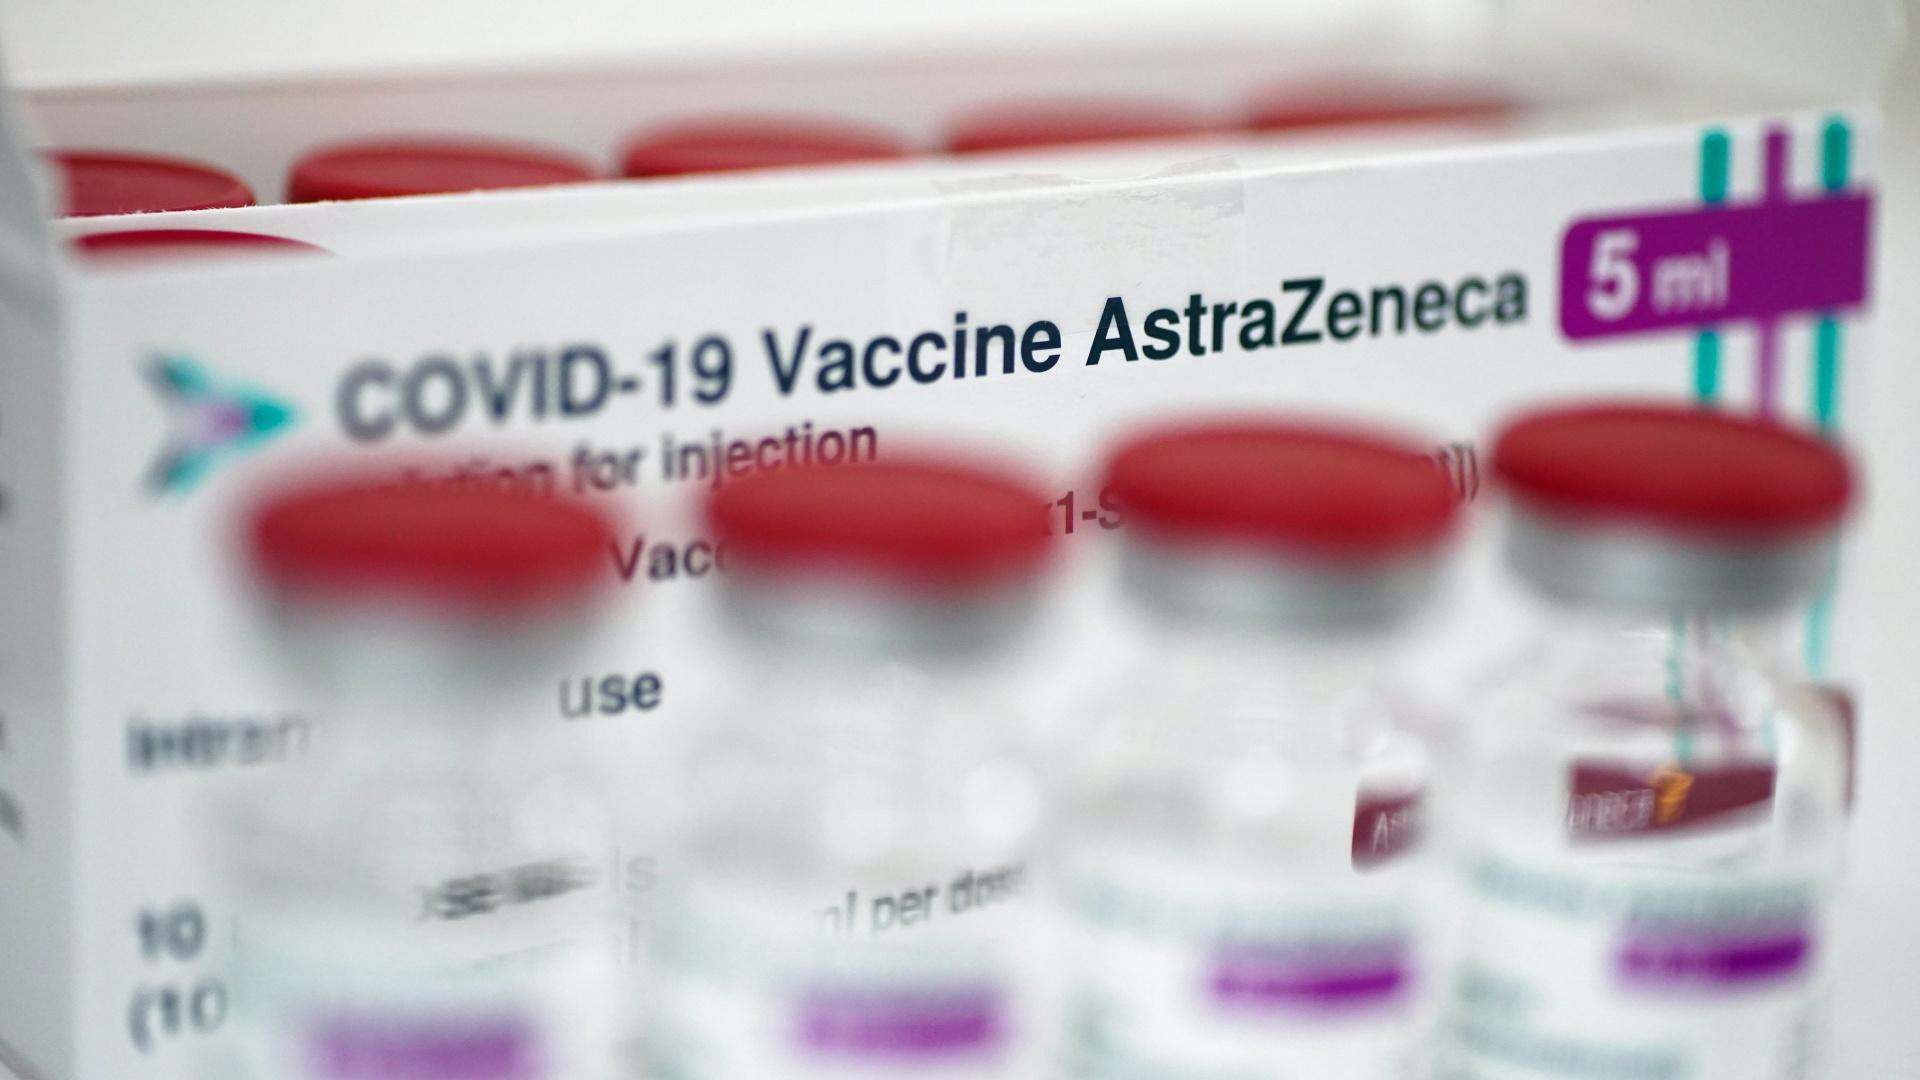 AstraZeneca koronavírus-vakcina